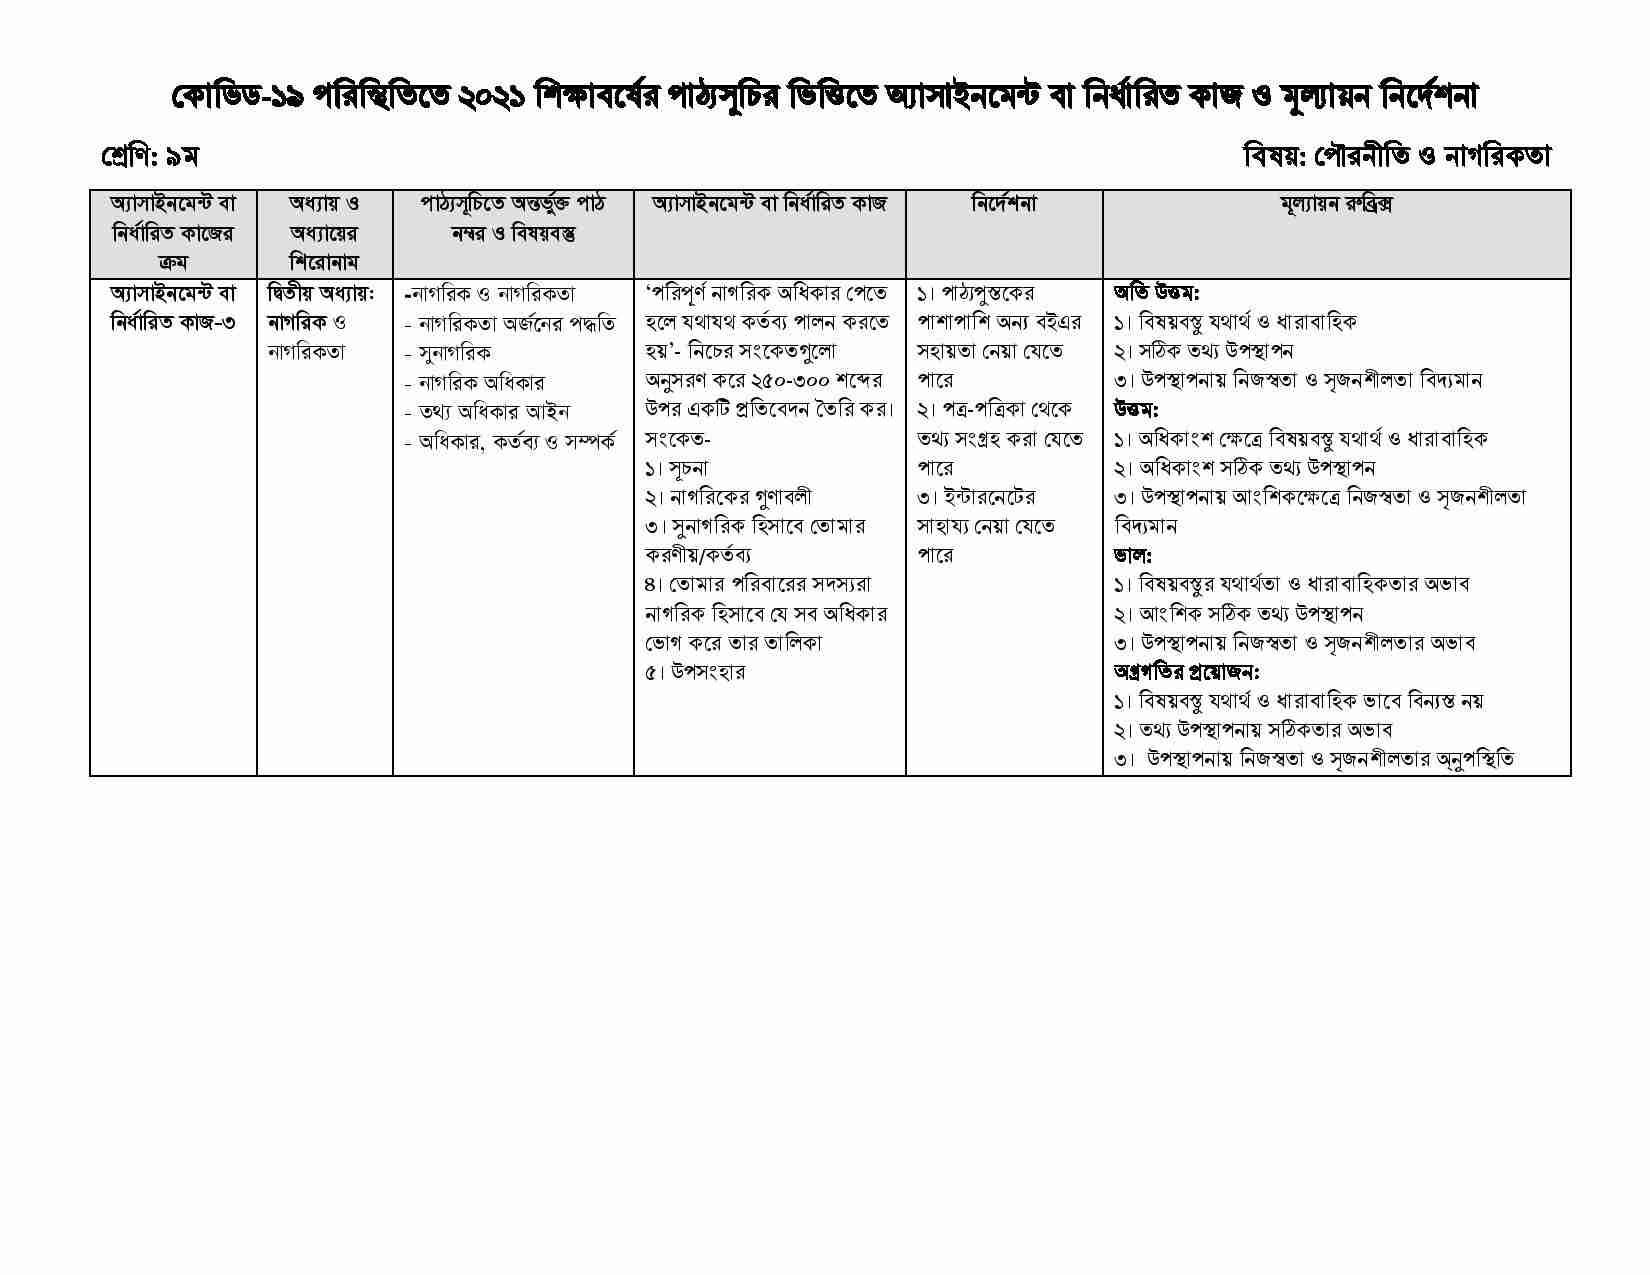 Class 9 13th Week Civics Subject Assignment 2021